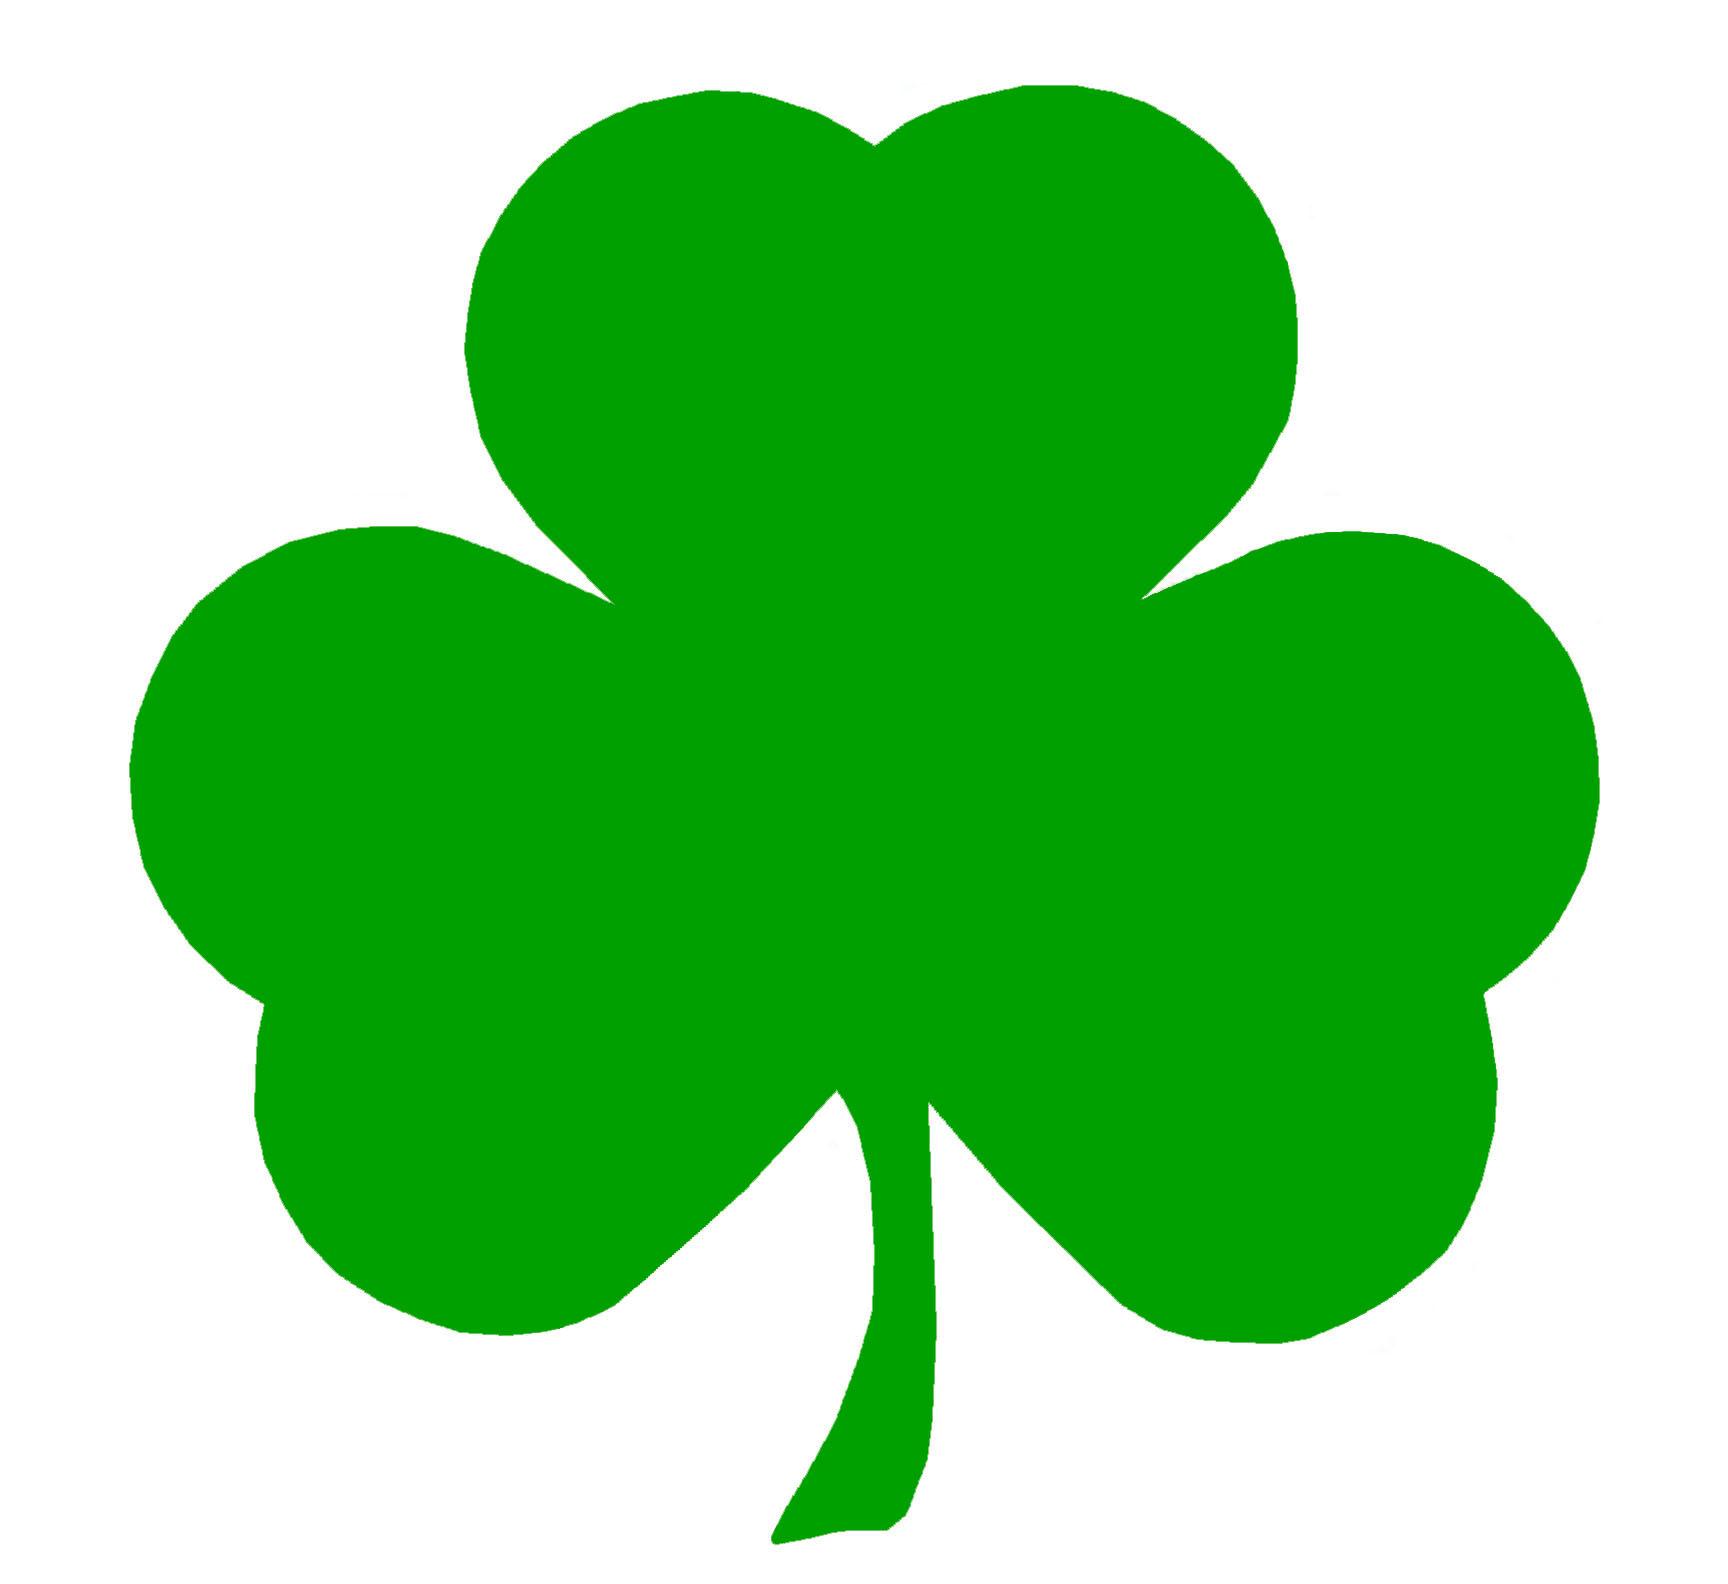 Irish Clover Clipart-Irish Clover Clipart-15